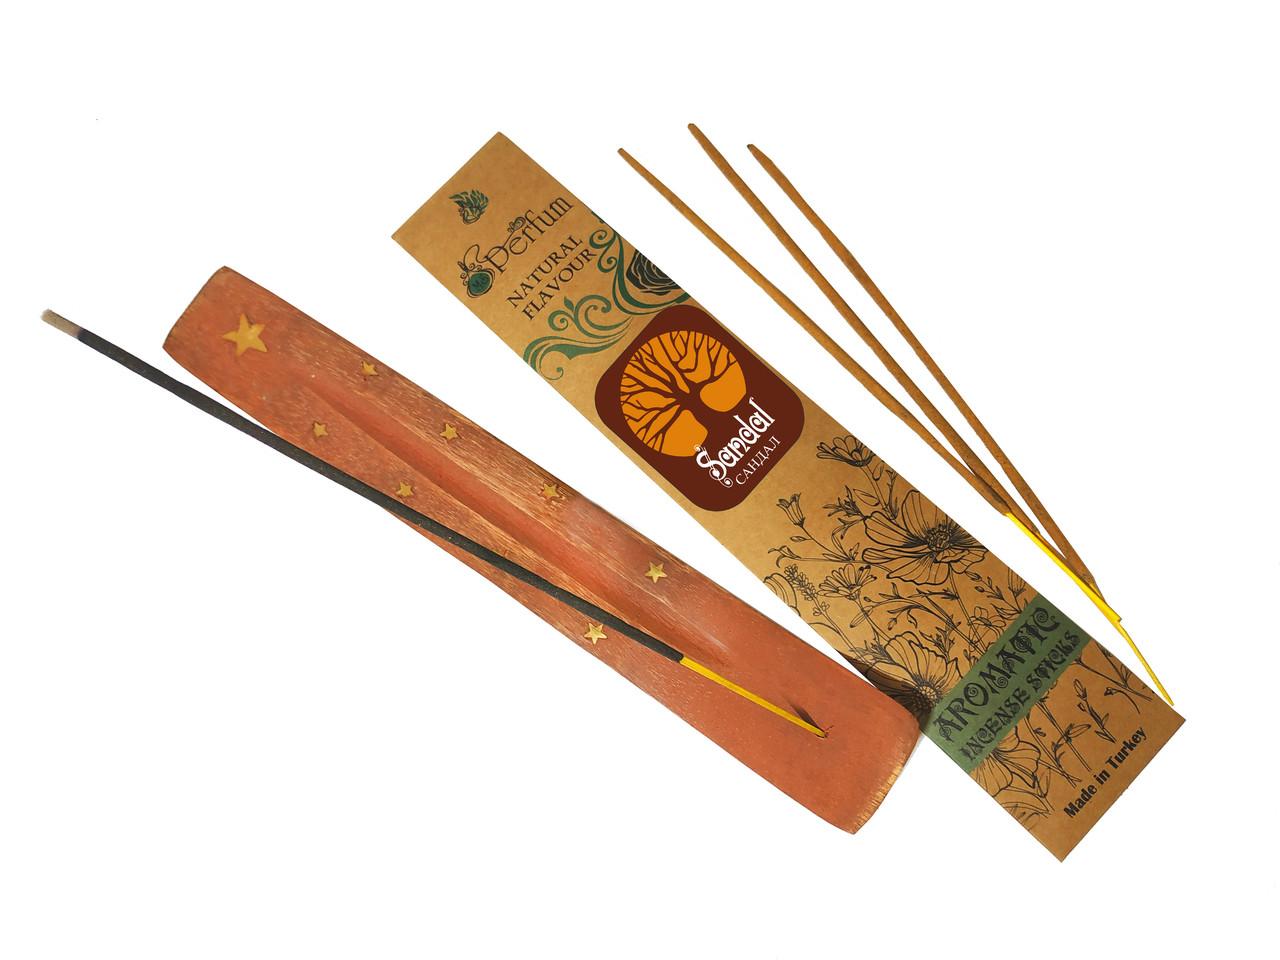 Набор: аромапалочки с ароматом сандала + деревянная подставка под благовония